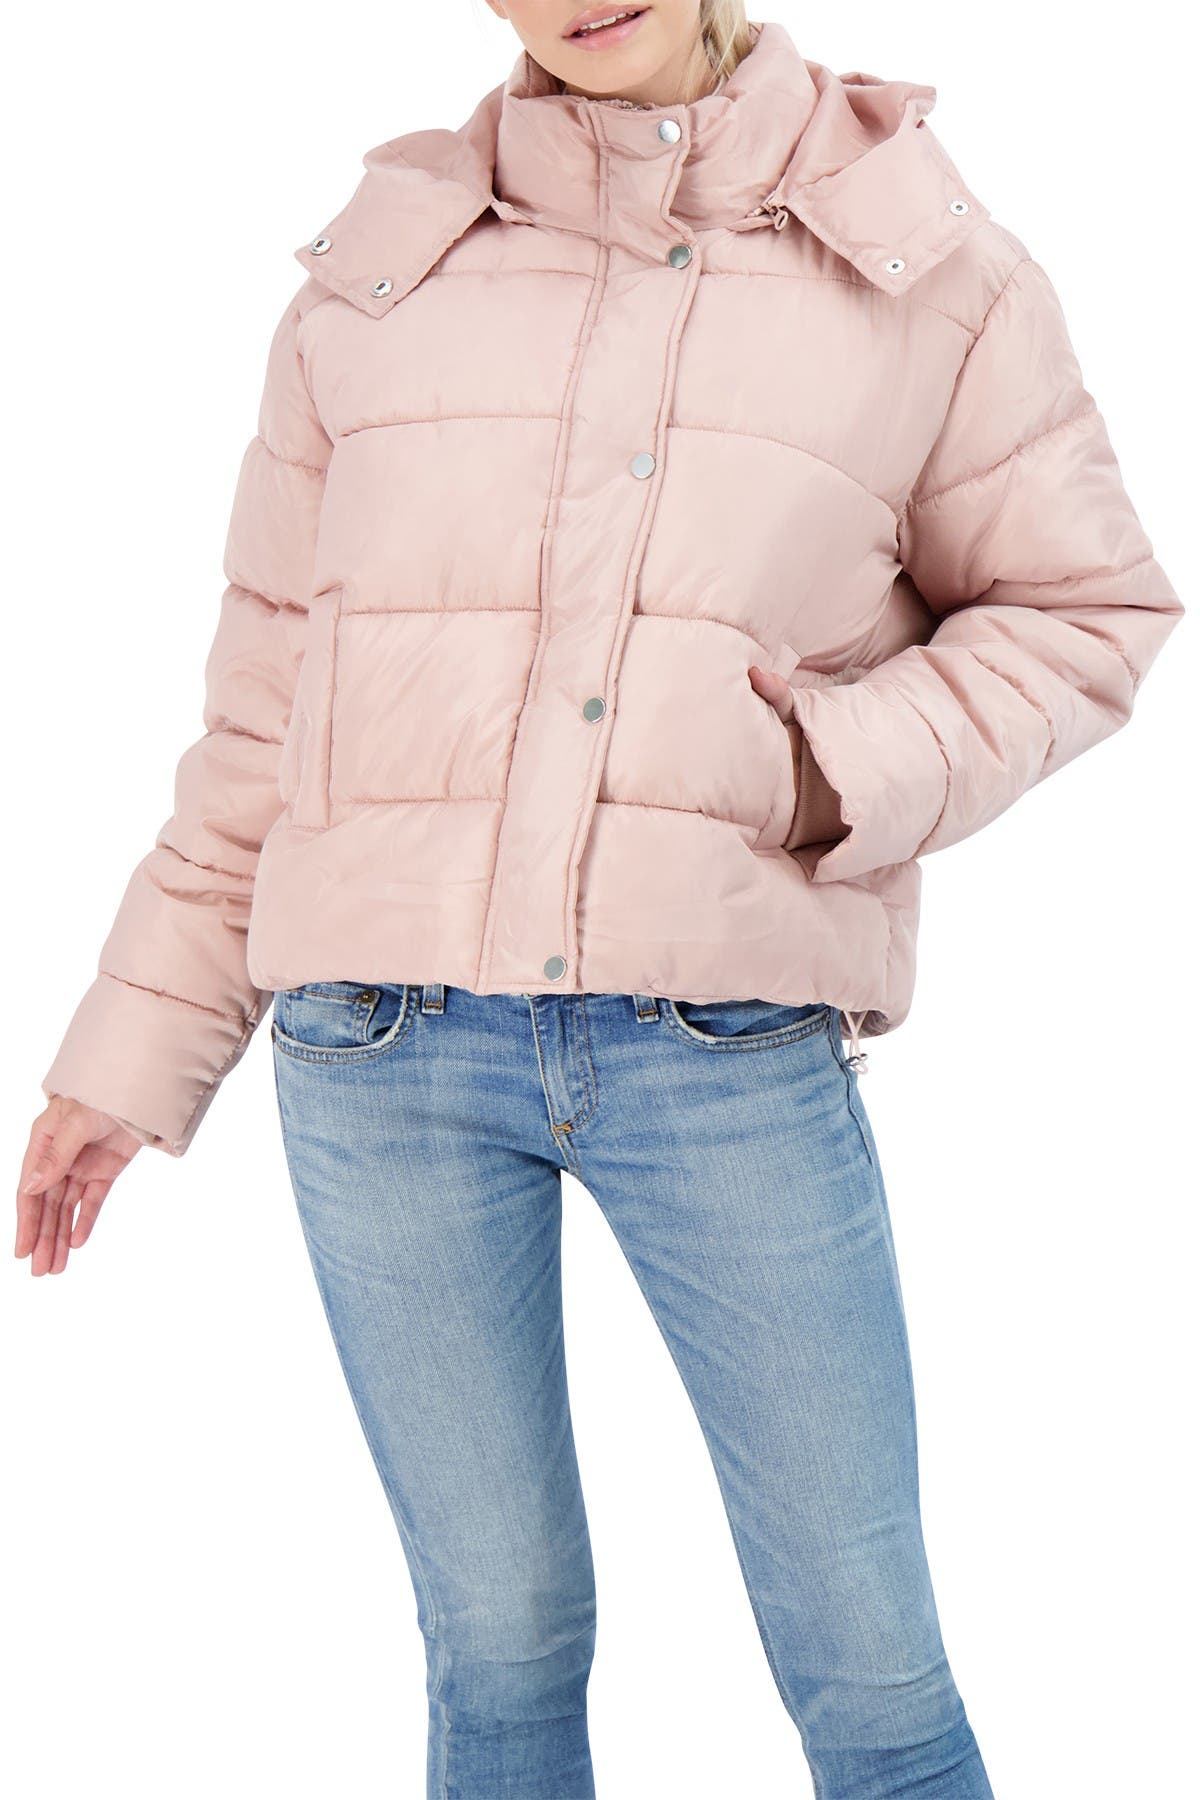 Image of Sebby Hooded Puffer Jacket